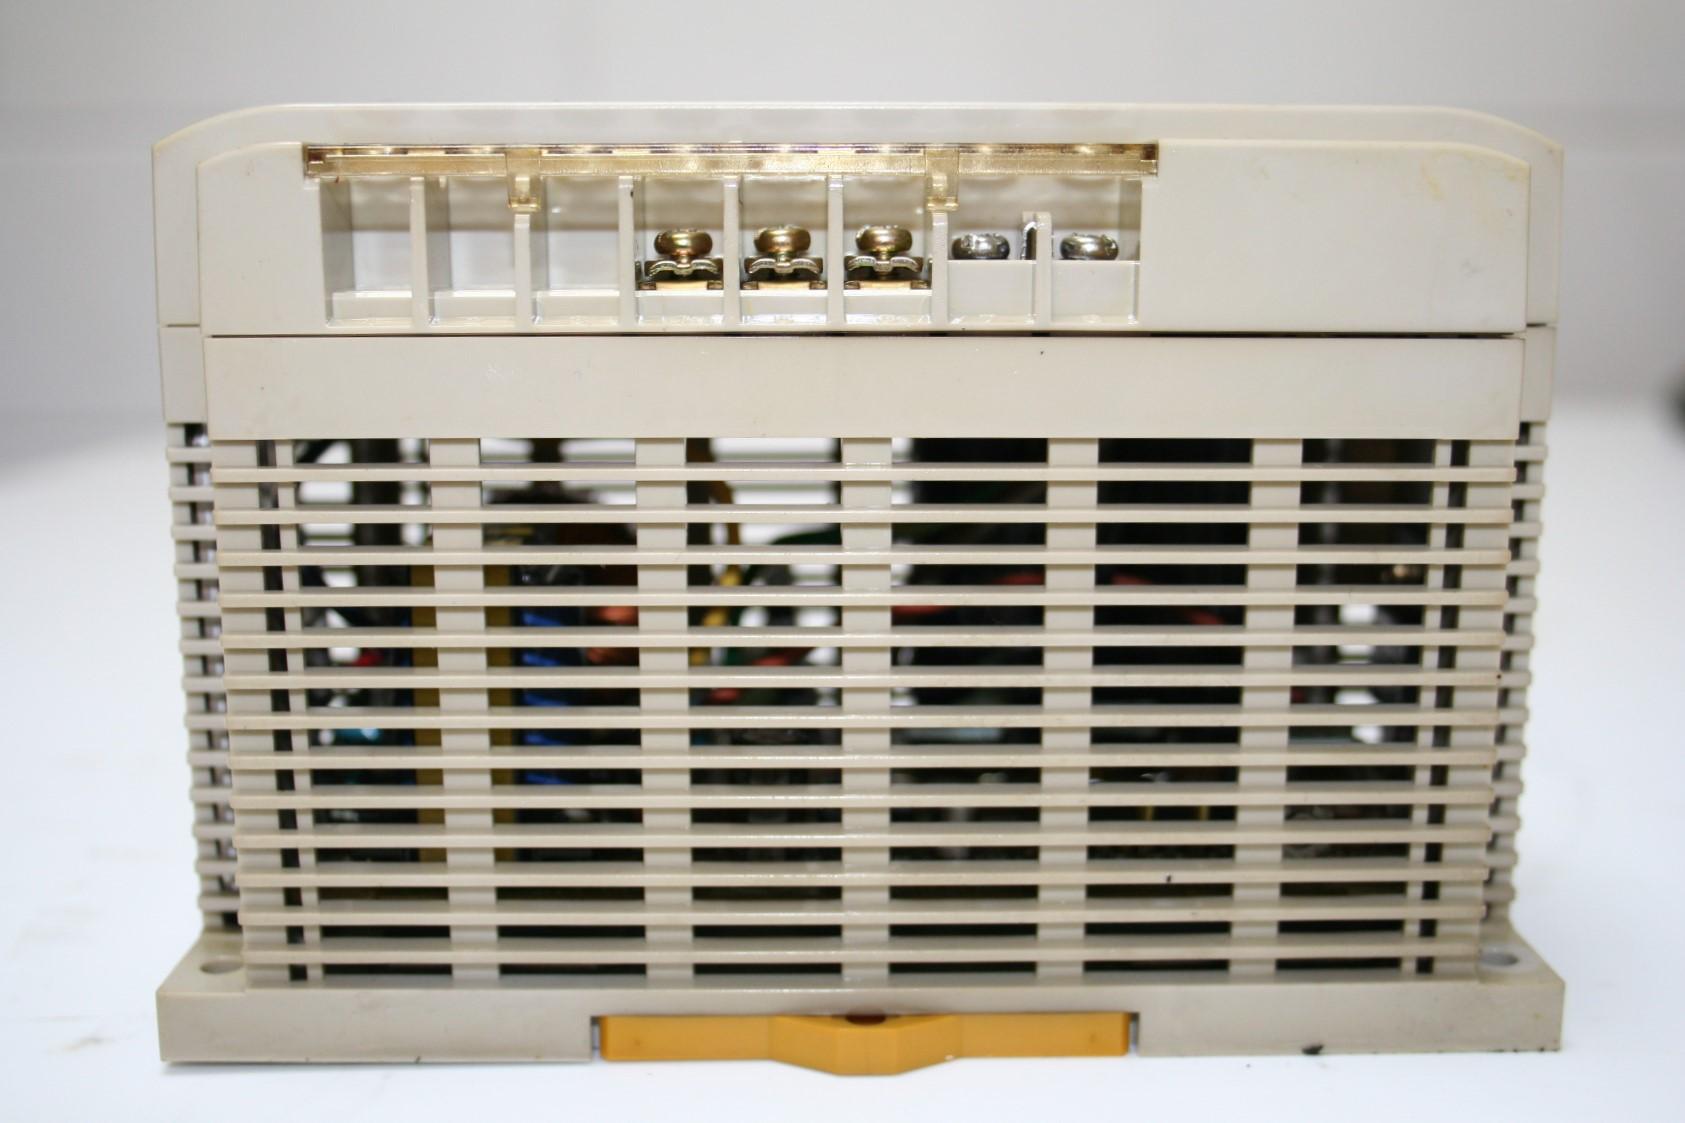 Omron S82k-05024 Power Supply 1